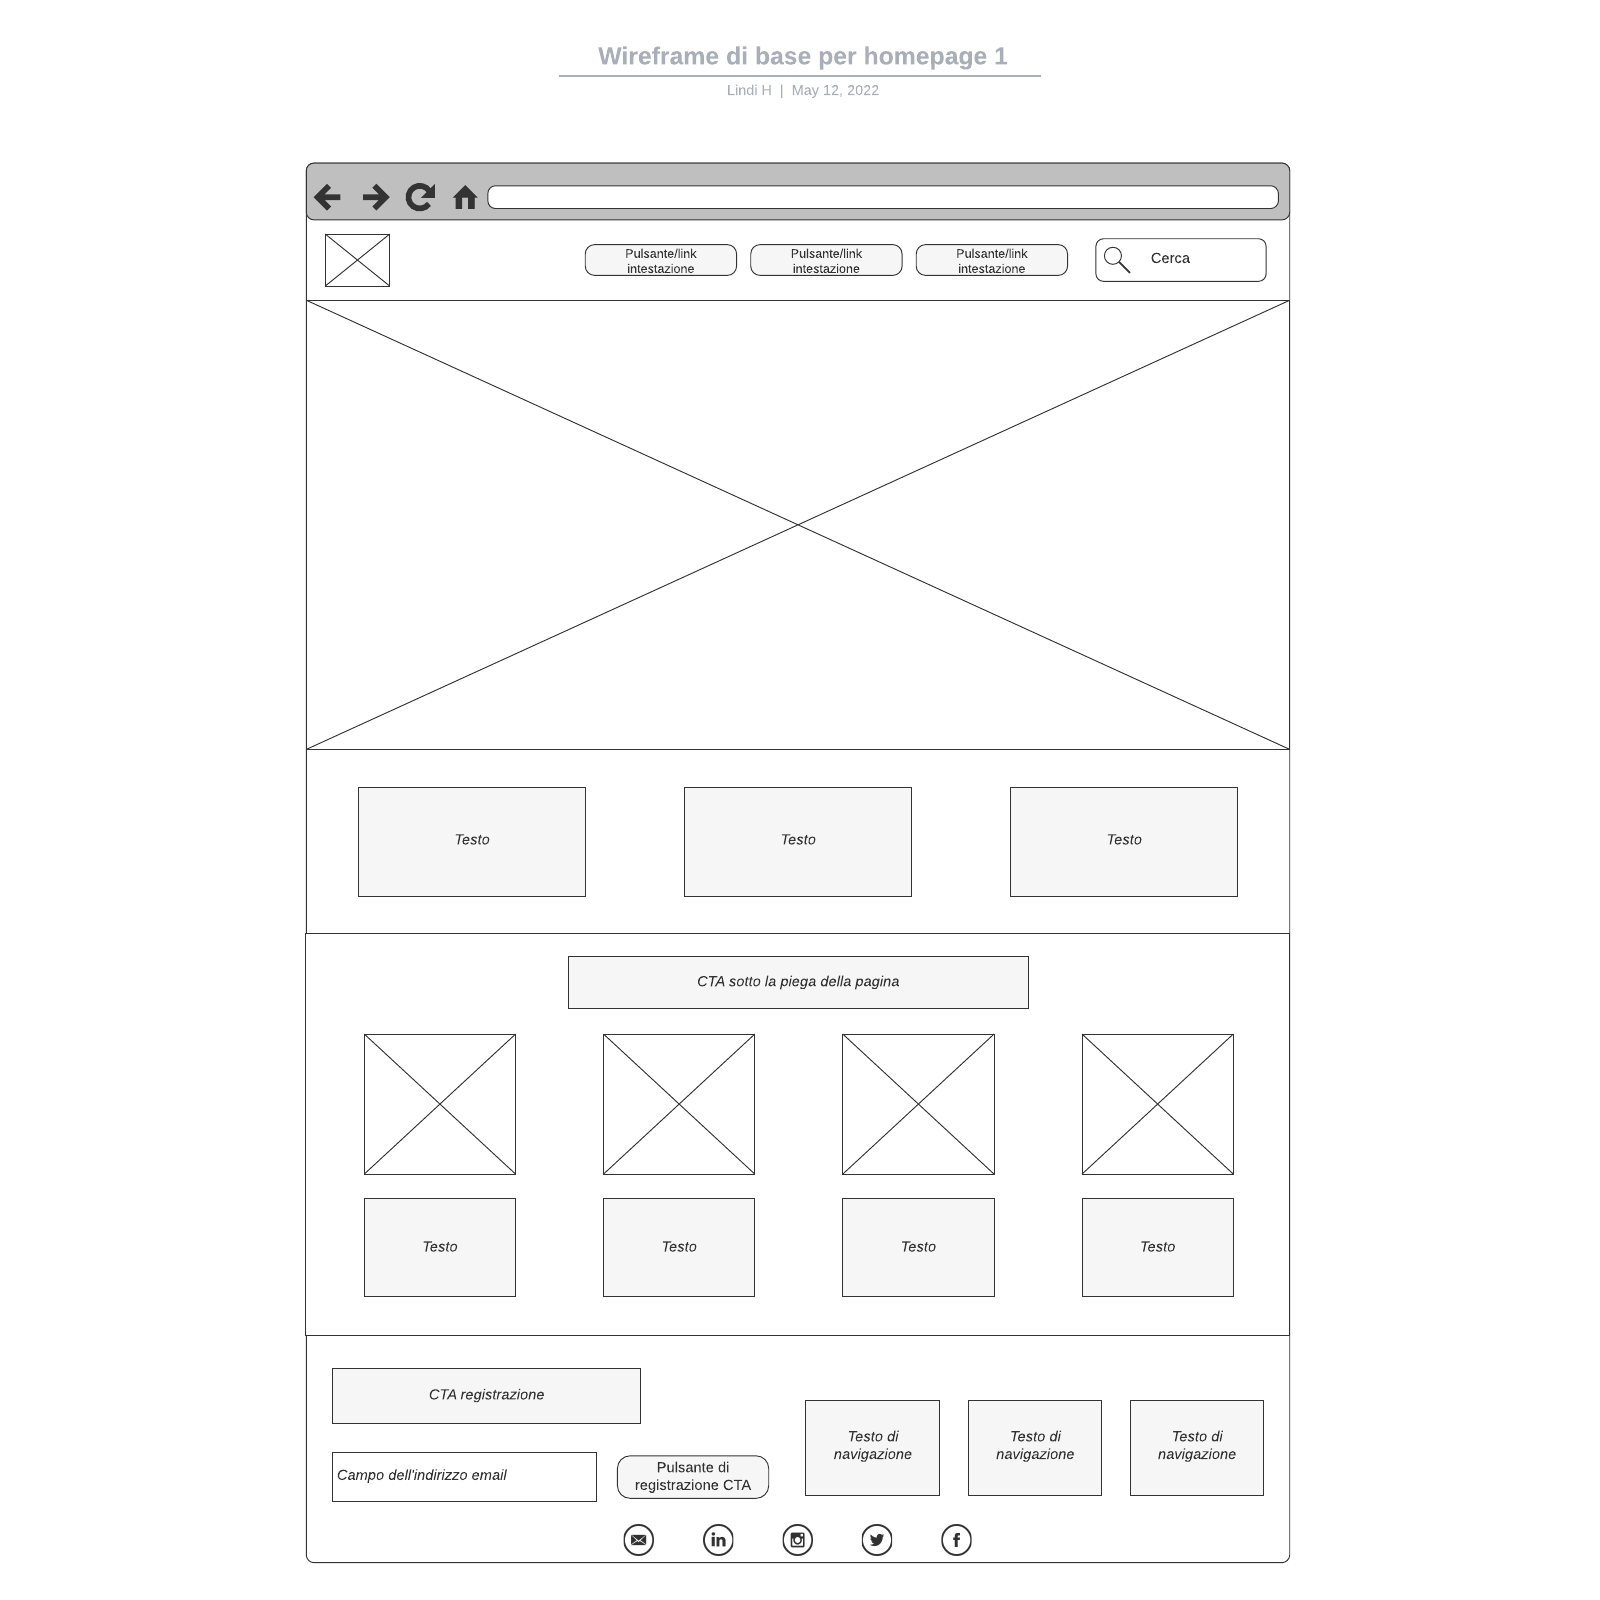 Wireframe di base per homepage 1